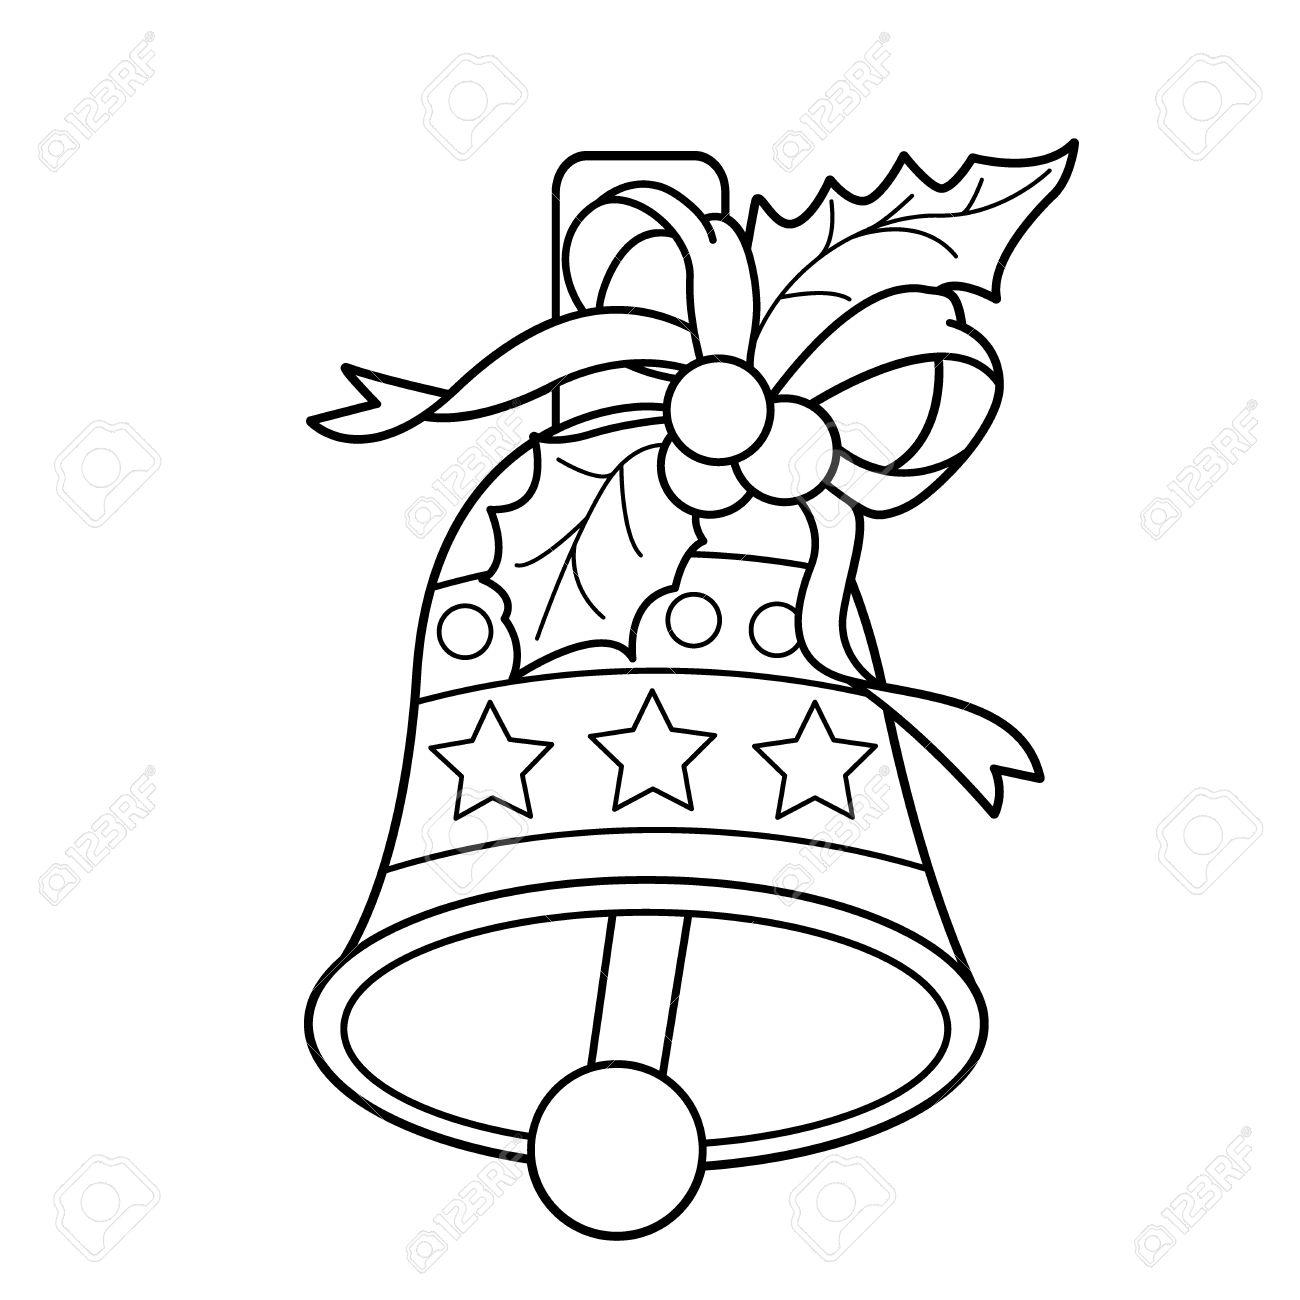 Dibujo De Navidad Para Nios. Affordable Diseos De Mandalas Navideos ...